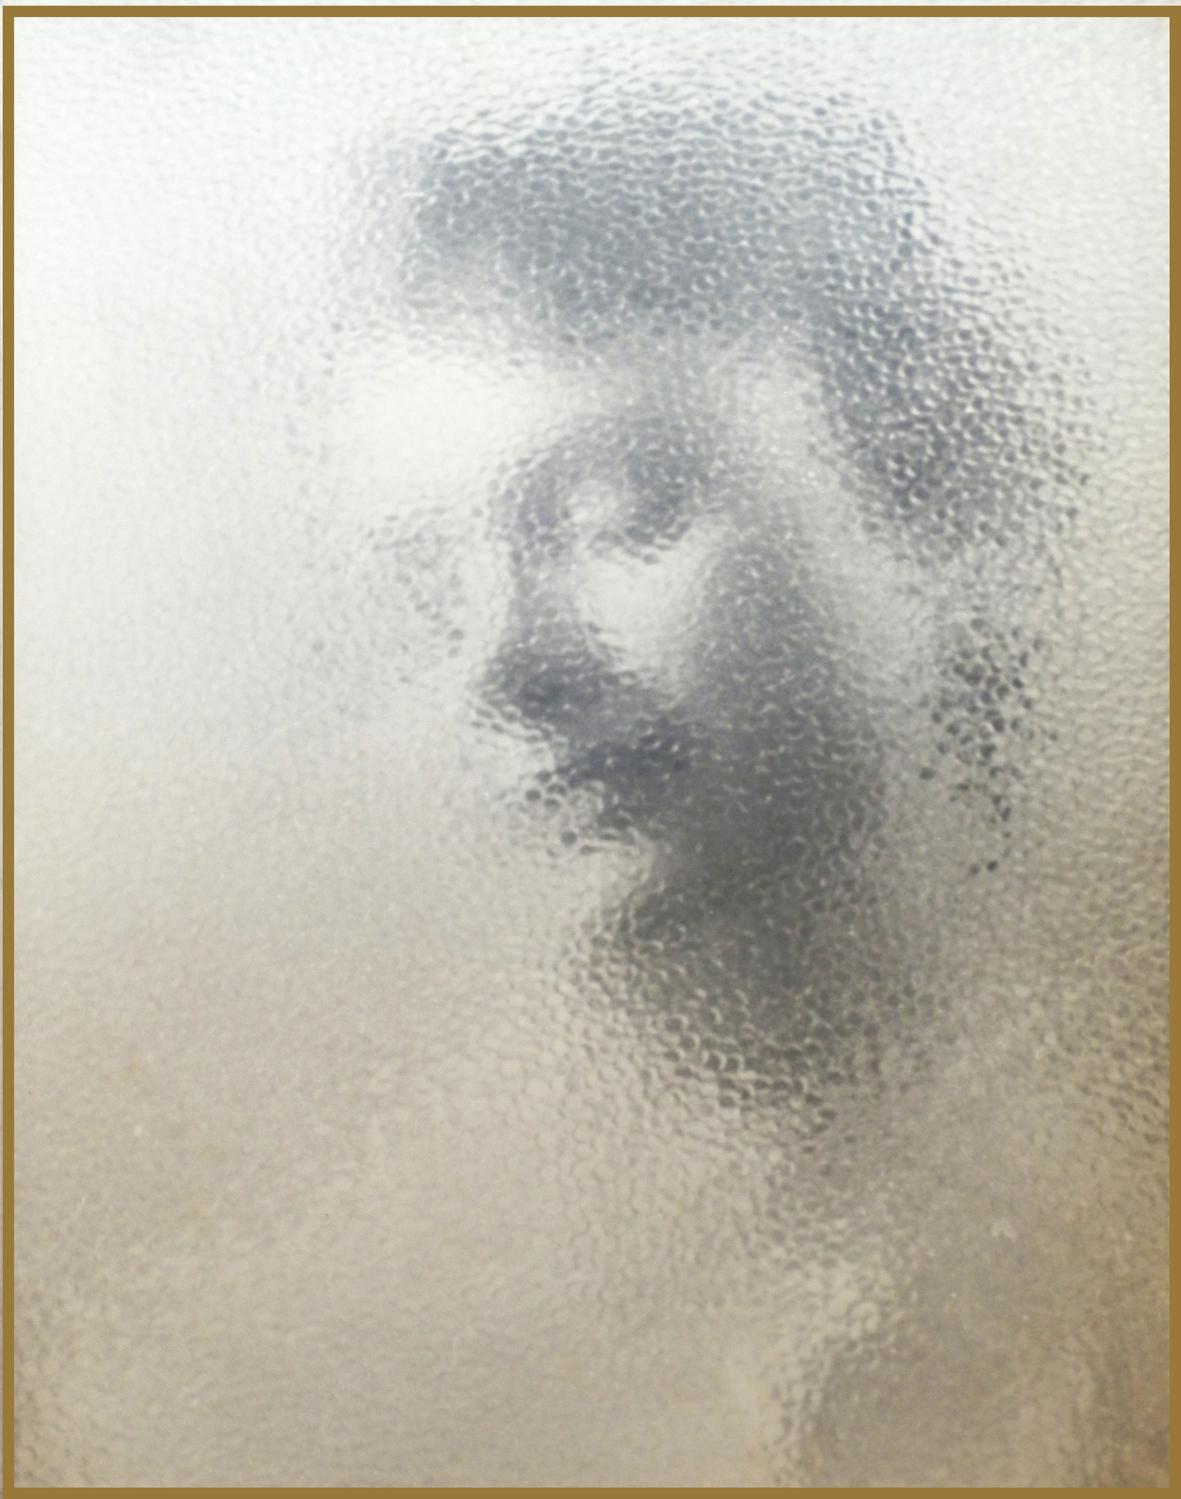 16.-José-Luis-Gota-1955